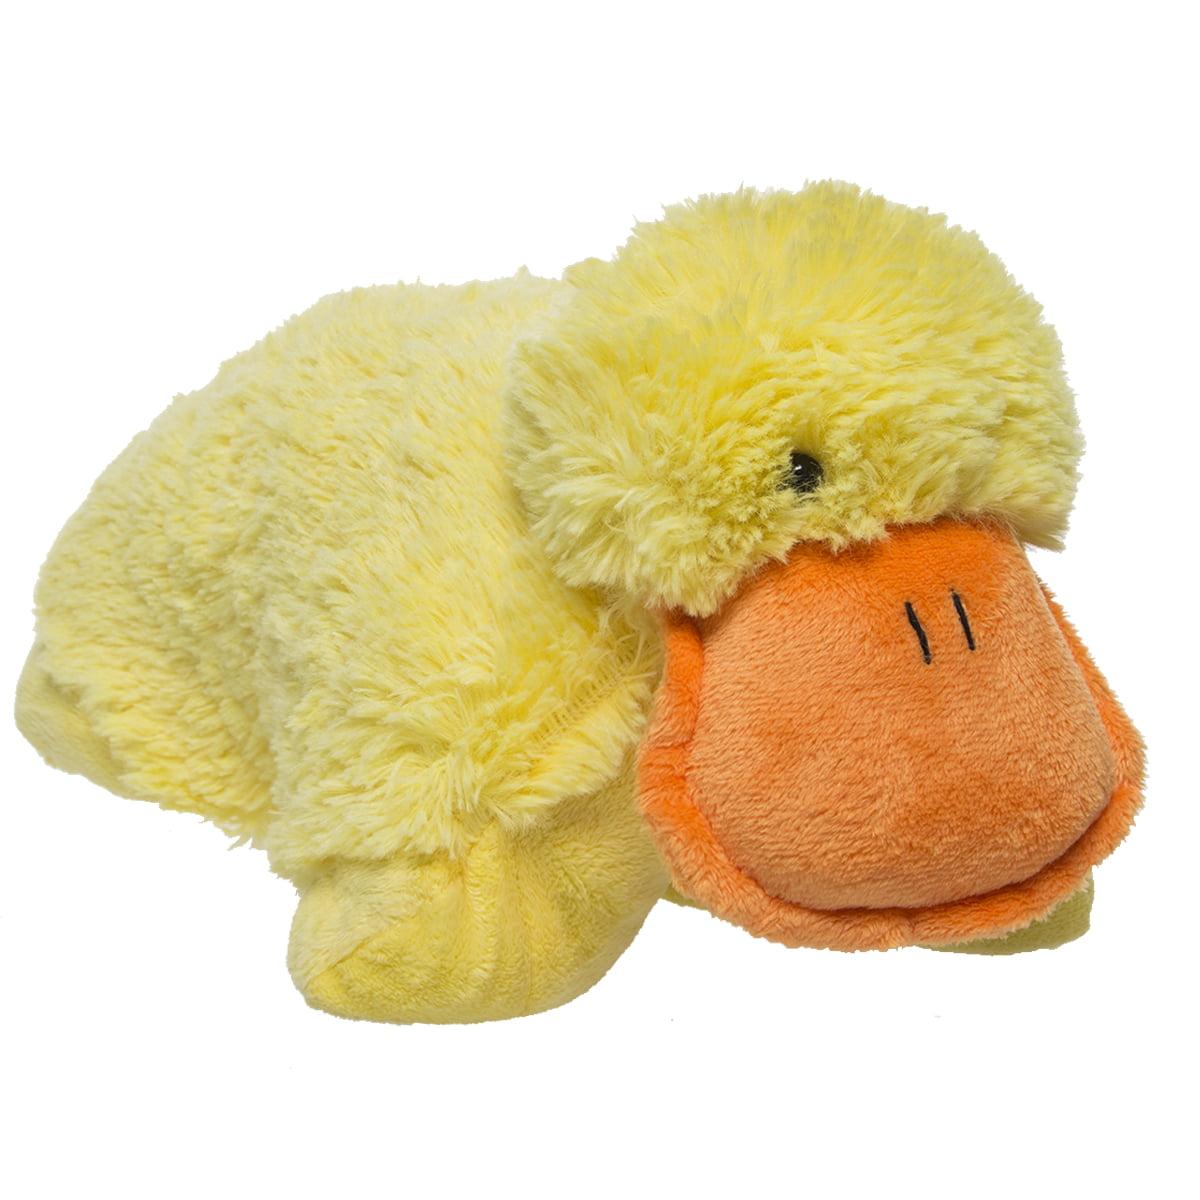 Pillow Pets Pee Wee 11 Super Soft Stuffed Animal Pillow For Kids